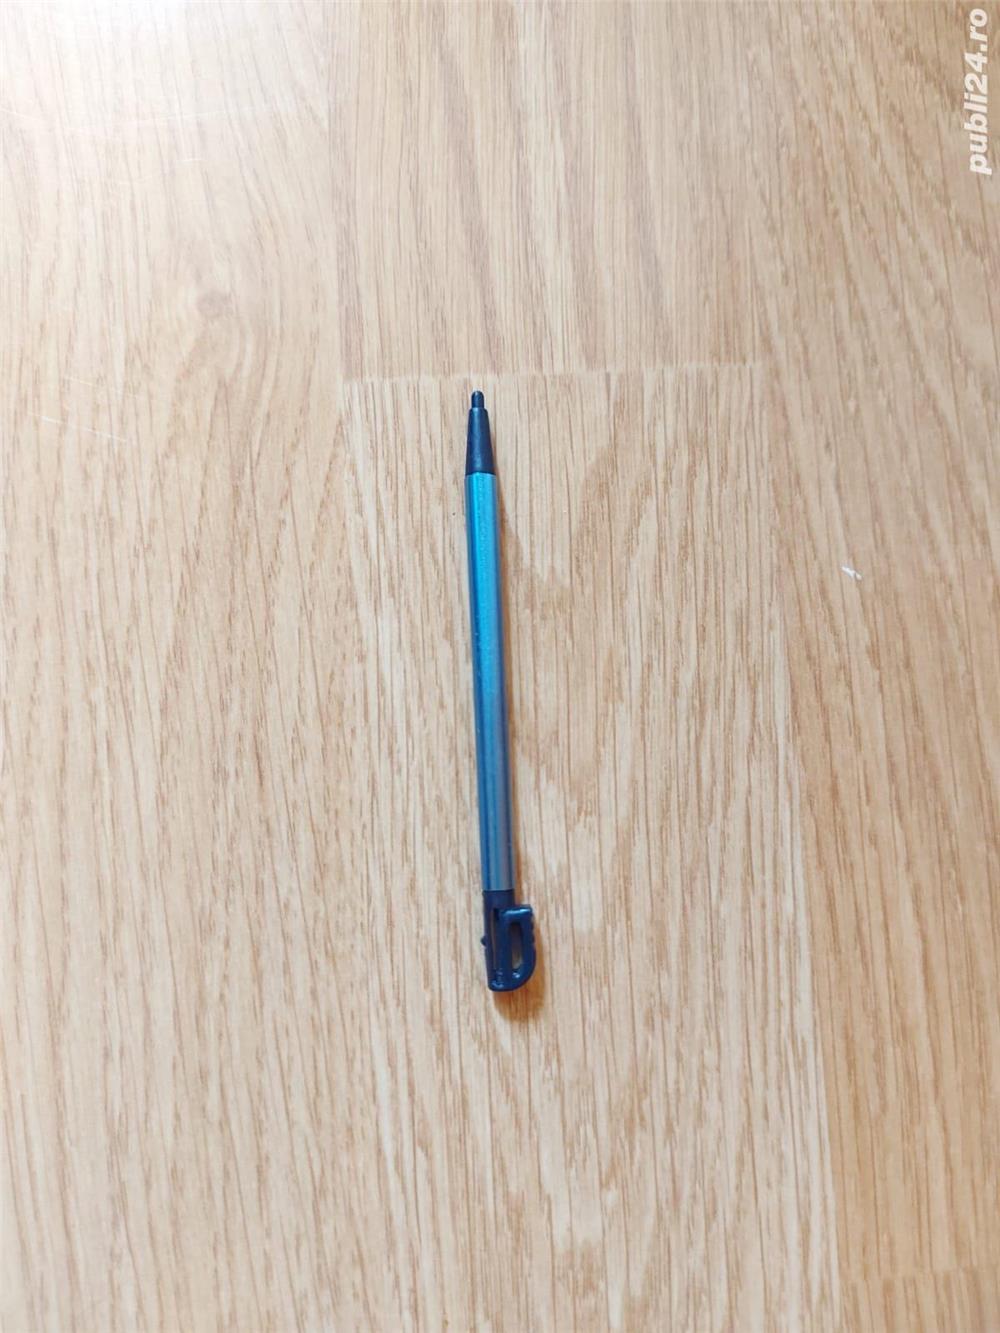 Creion pentru tuchscreen-uri capacitive